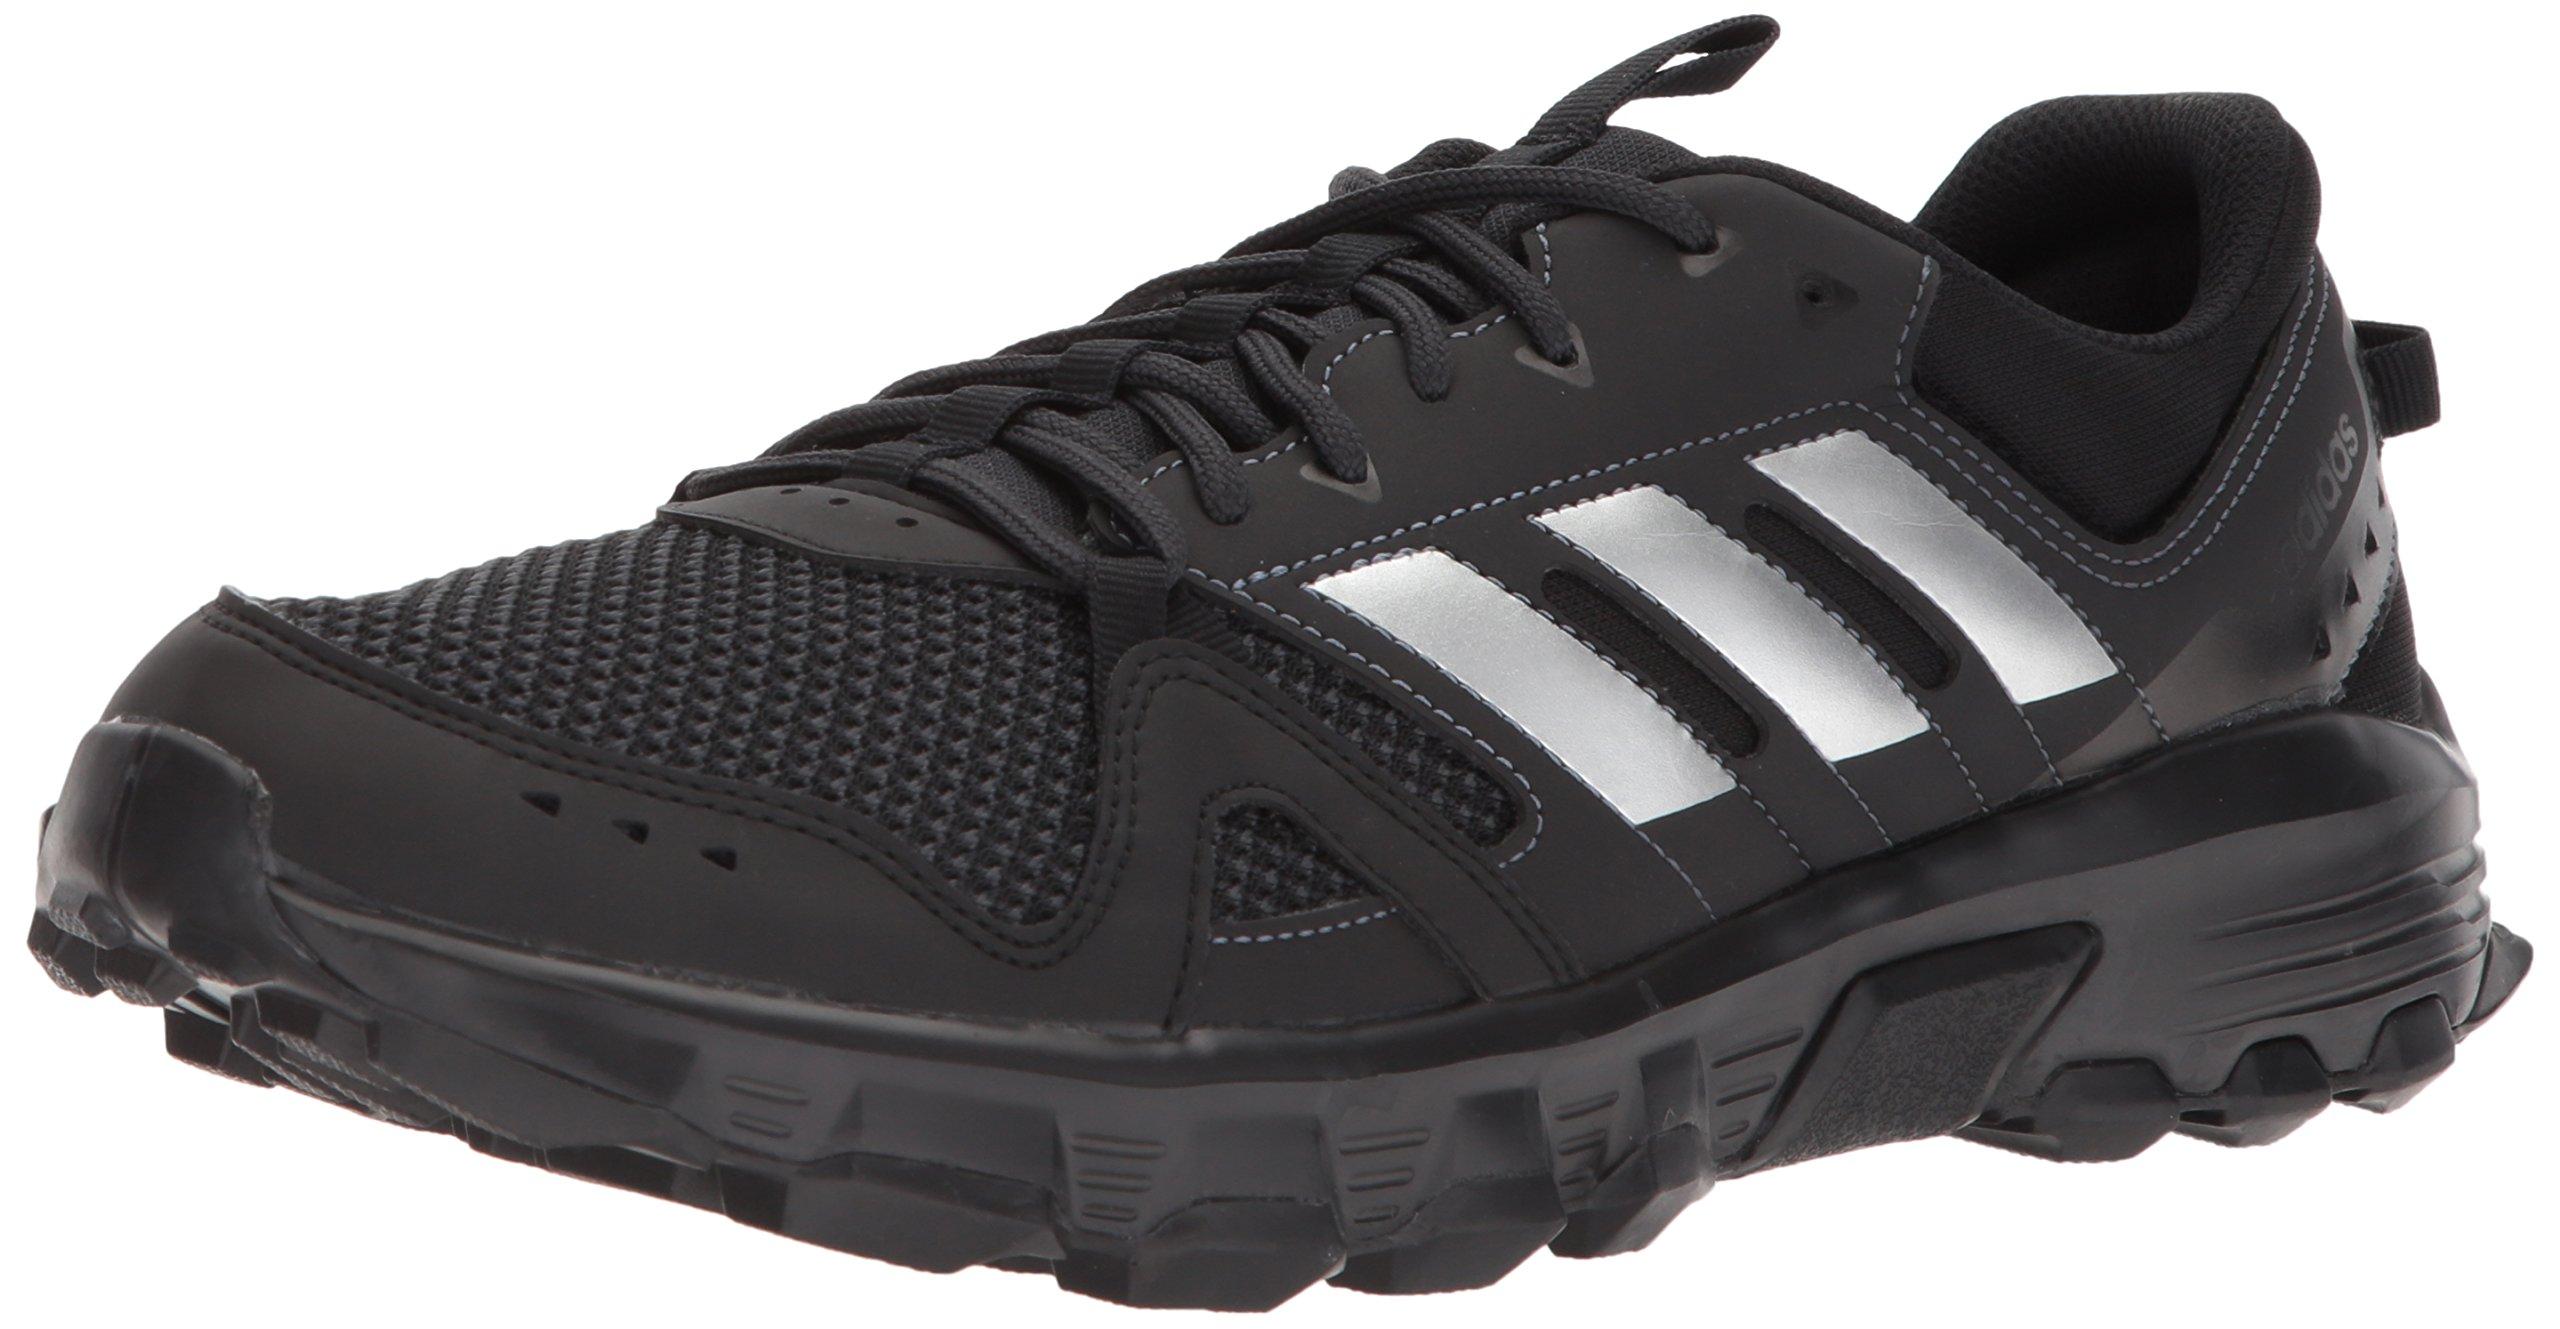 e14236e0bc10b Get Quotations · adidas Men s Rockadia M Trail Running Shoe